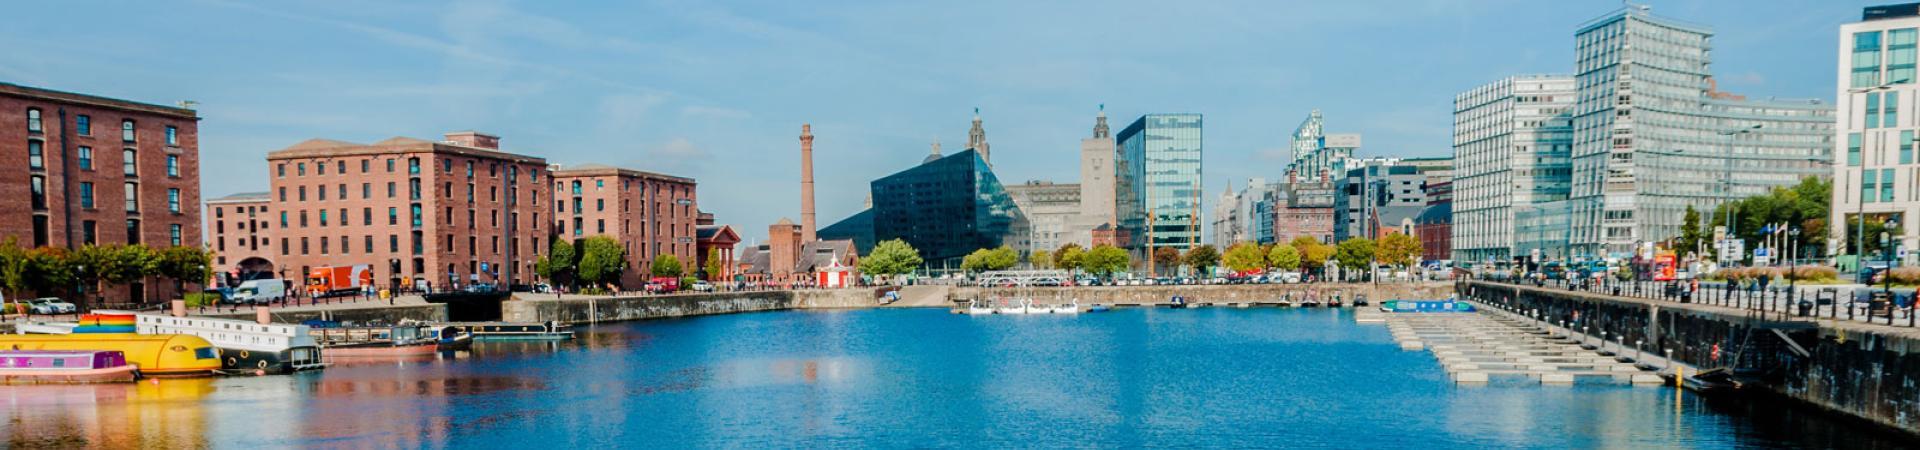 image of Liverpool docks